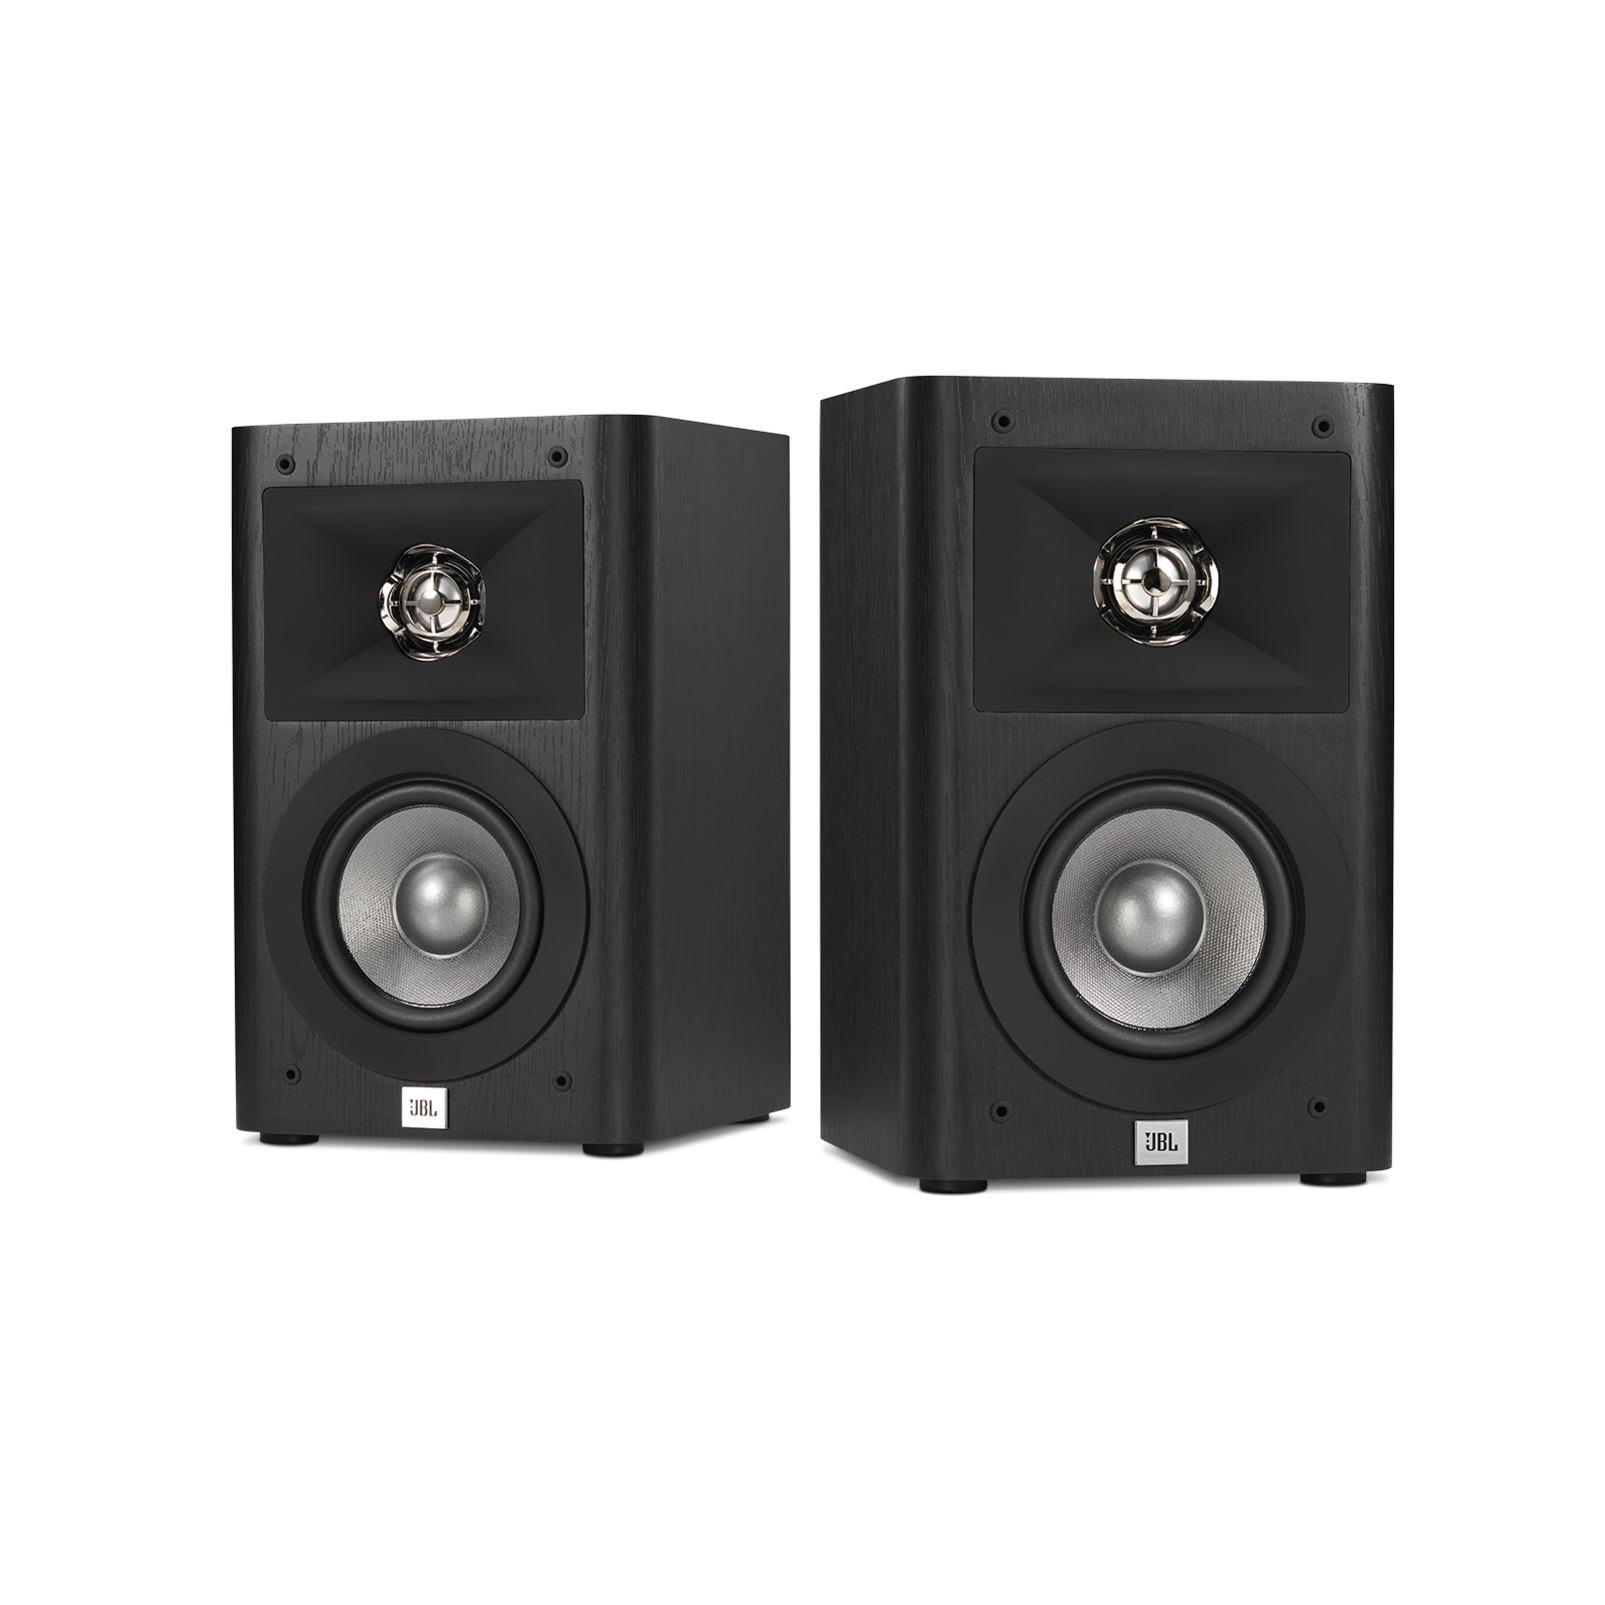 Studio 220 Powerful 2 Way 4 Inch Bookshelf Speakers Semiconductor Datasheets Subwoofer Crossover Amplifier